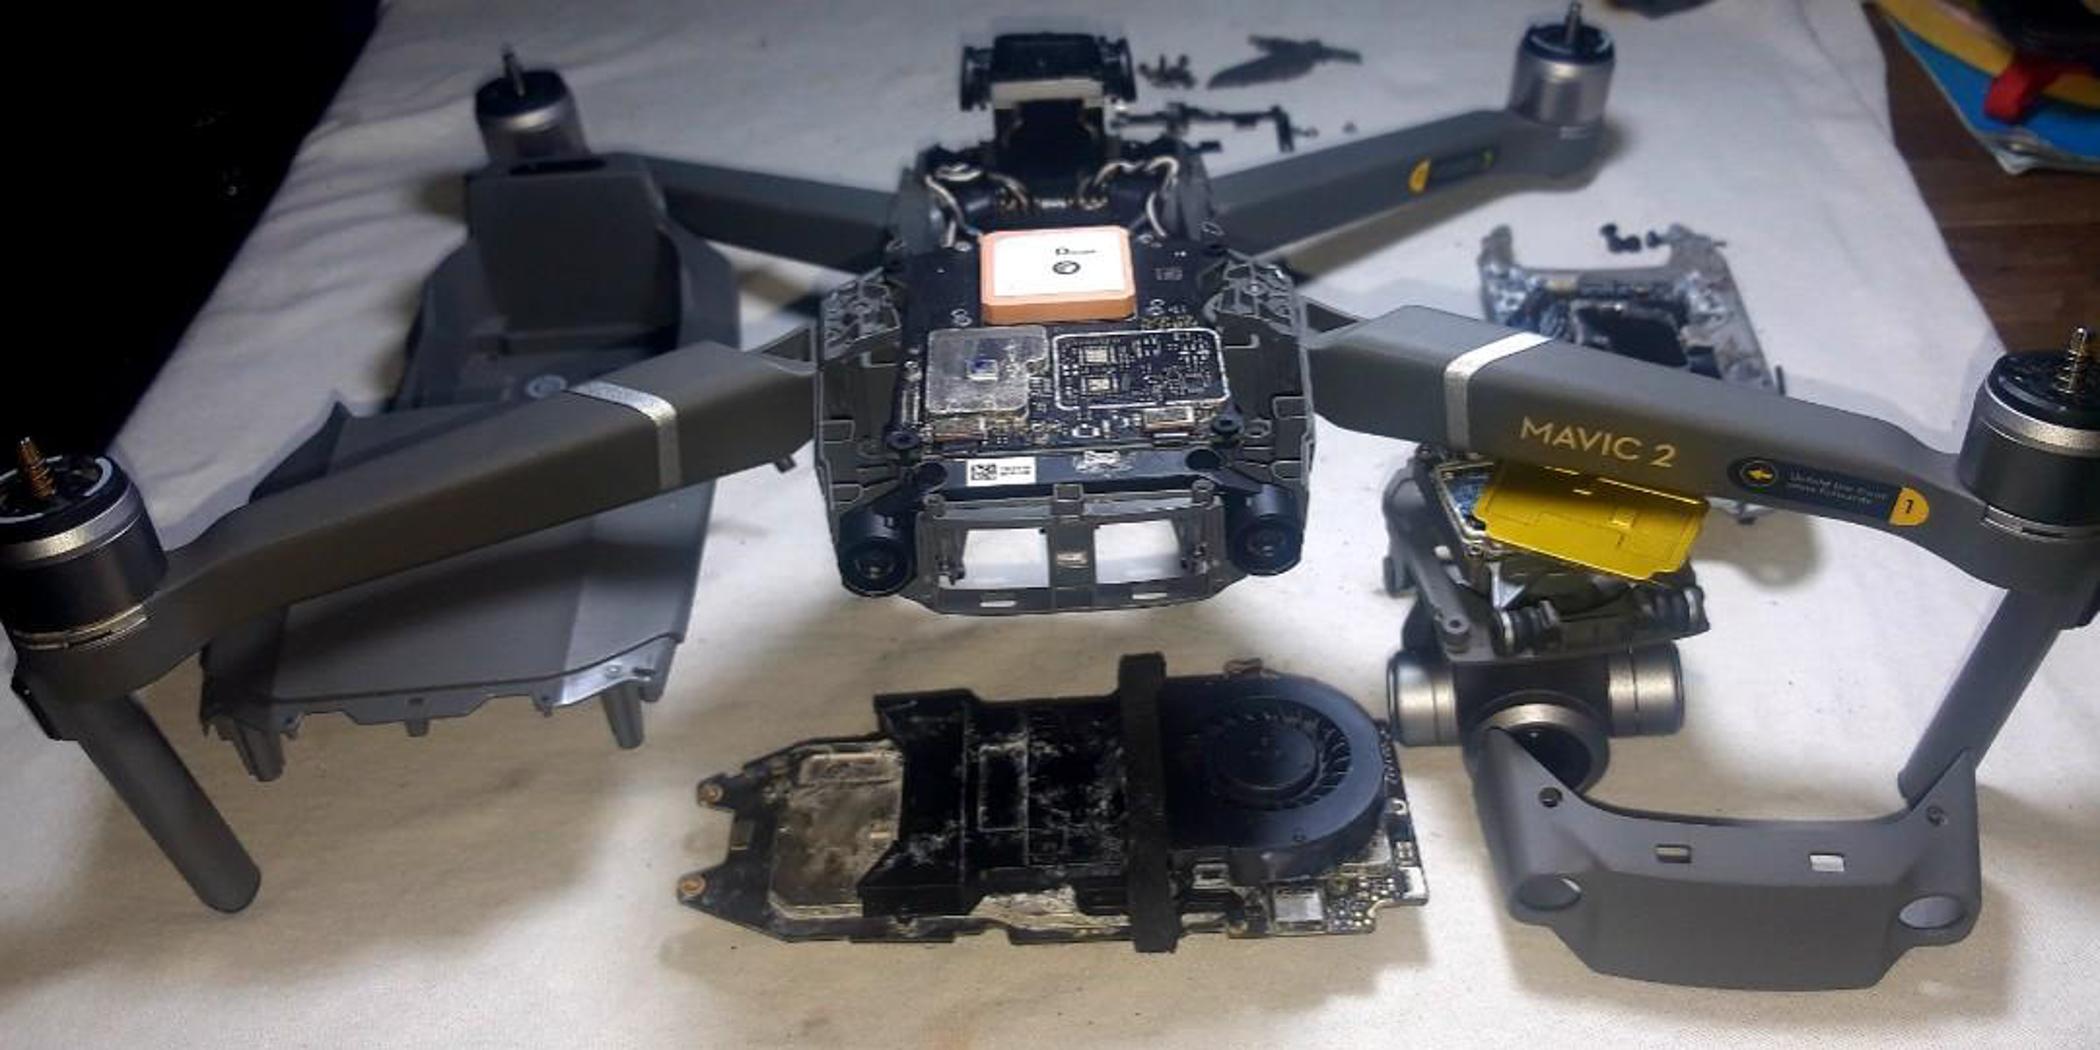 DJI Drone Repairs South Africa (www.skyhighphotography.co.za)